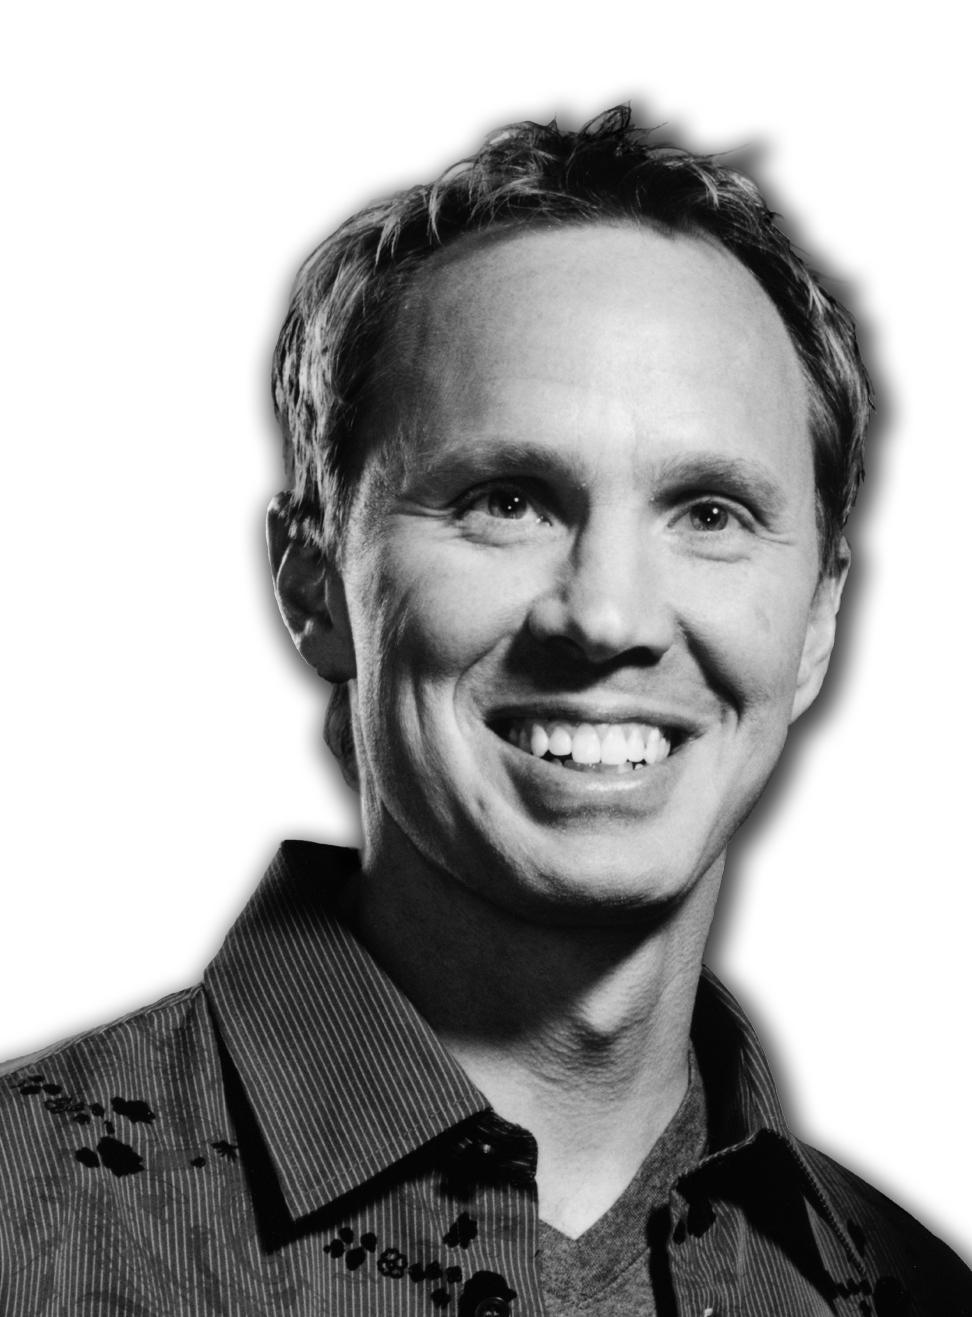 Radio host Eric Ferguson